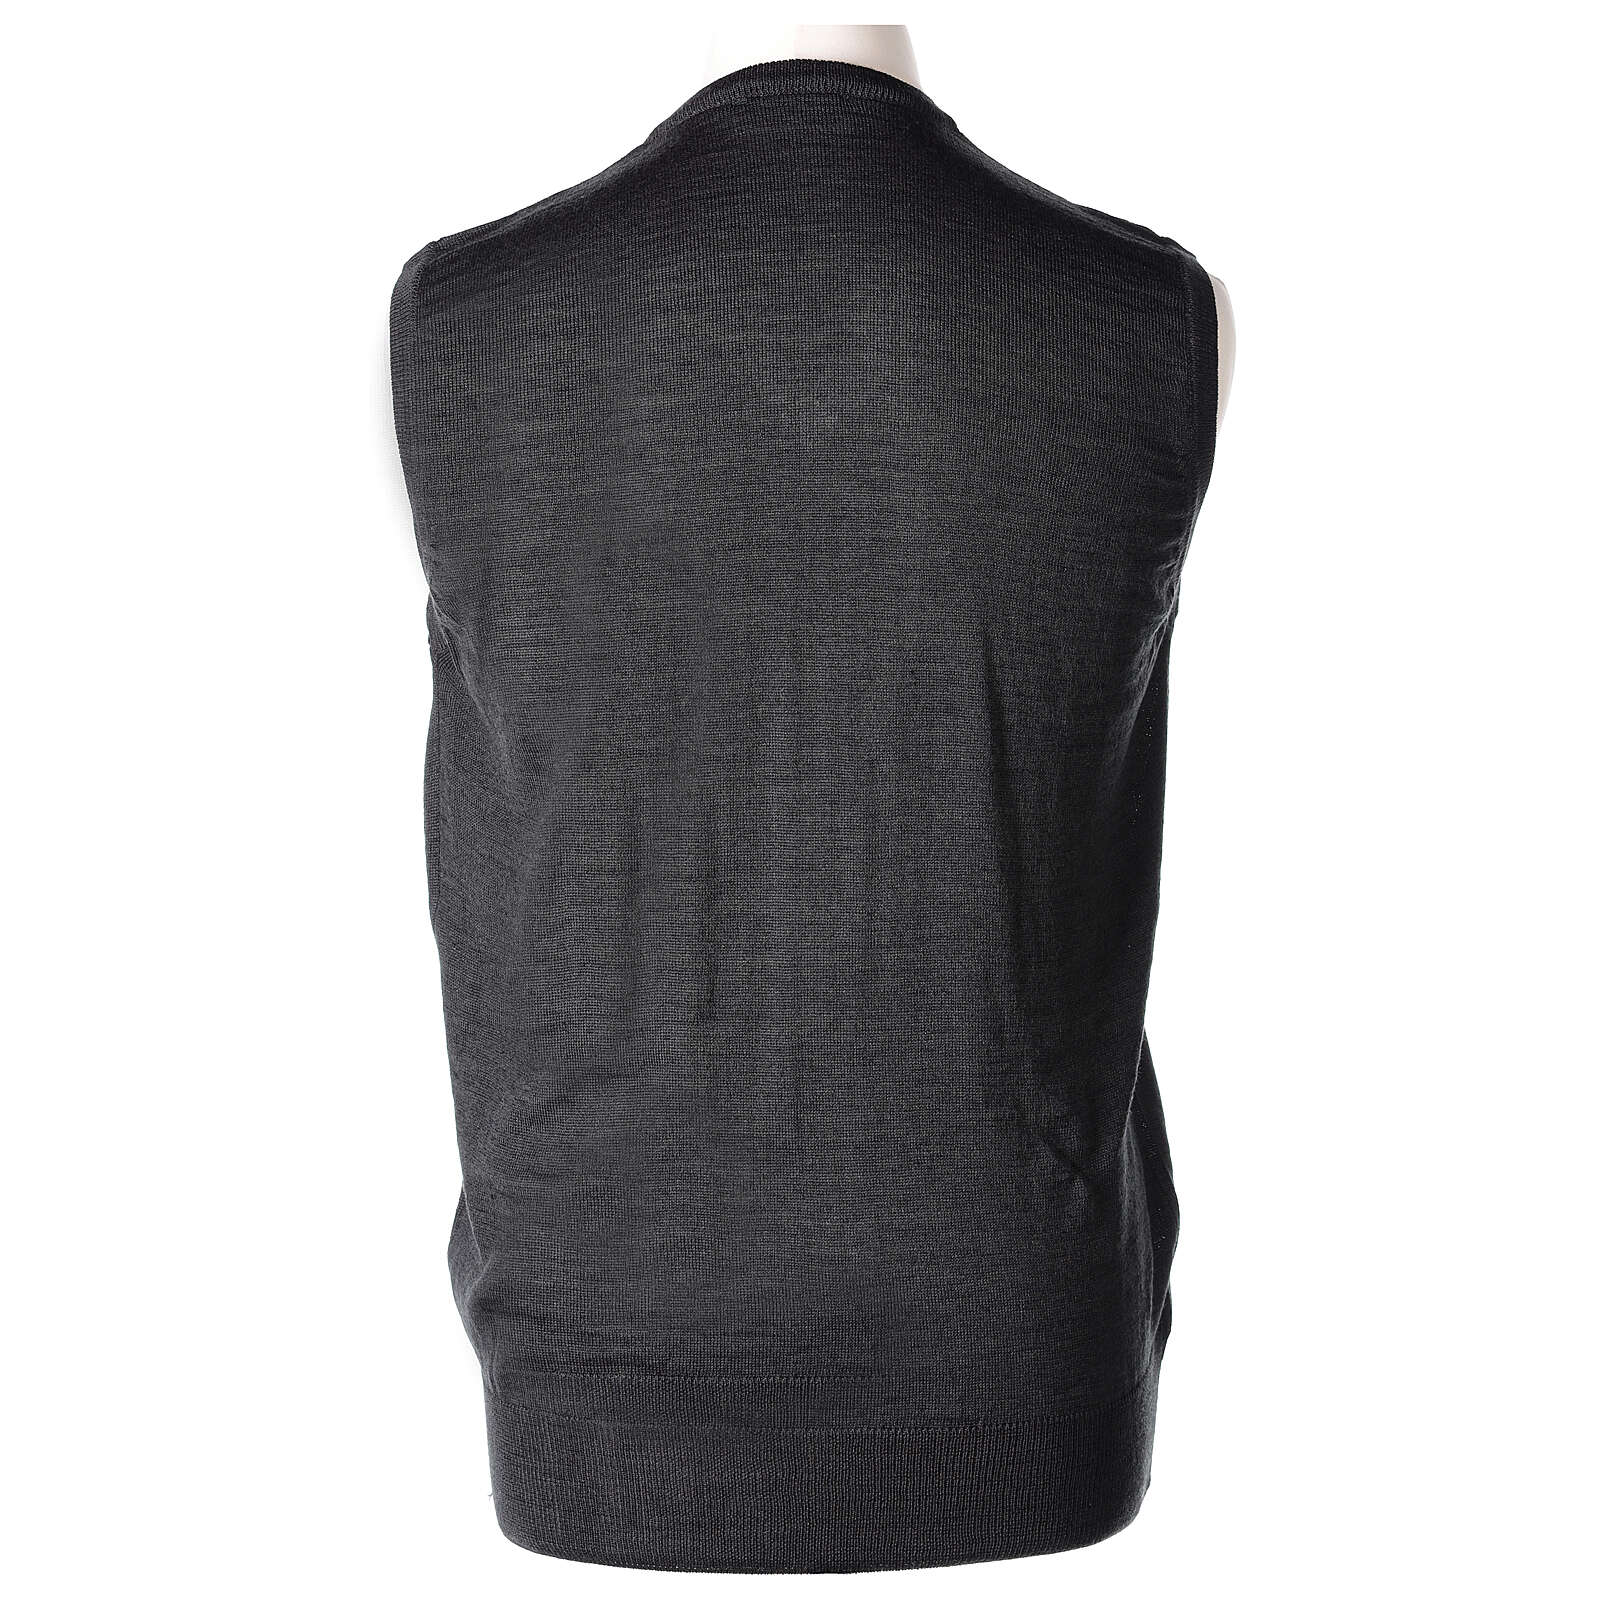 Colete sacerdote antracite sem botões tricô plano 50% lã de merino 50% acrílico In Primis 4